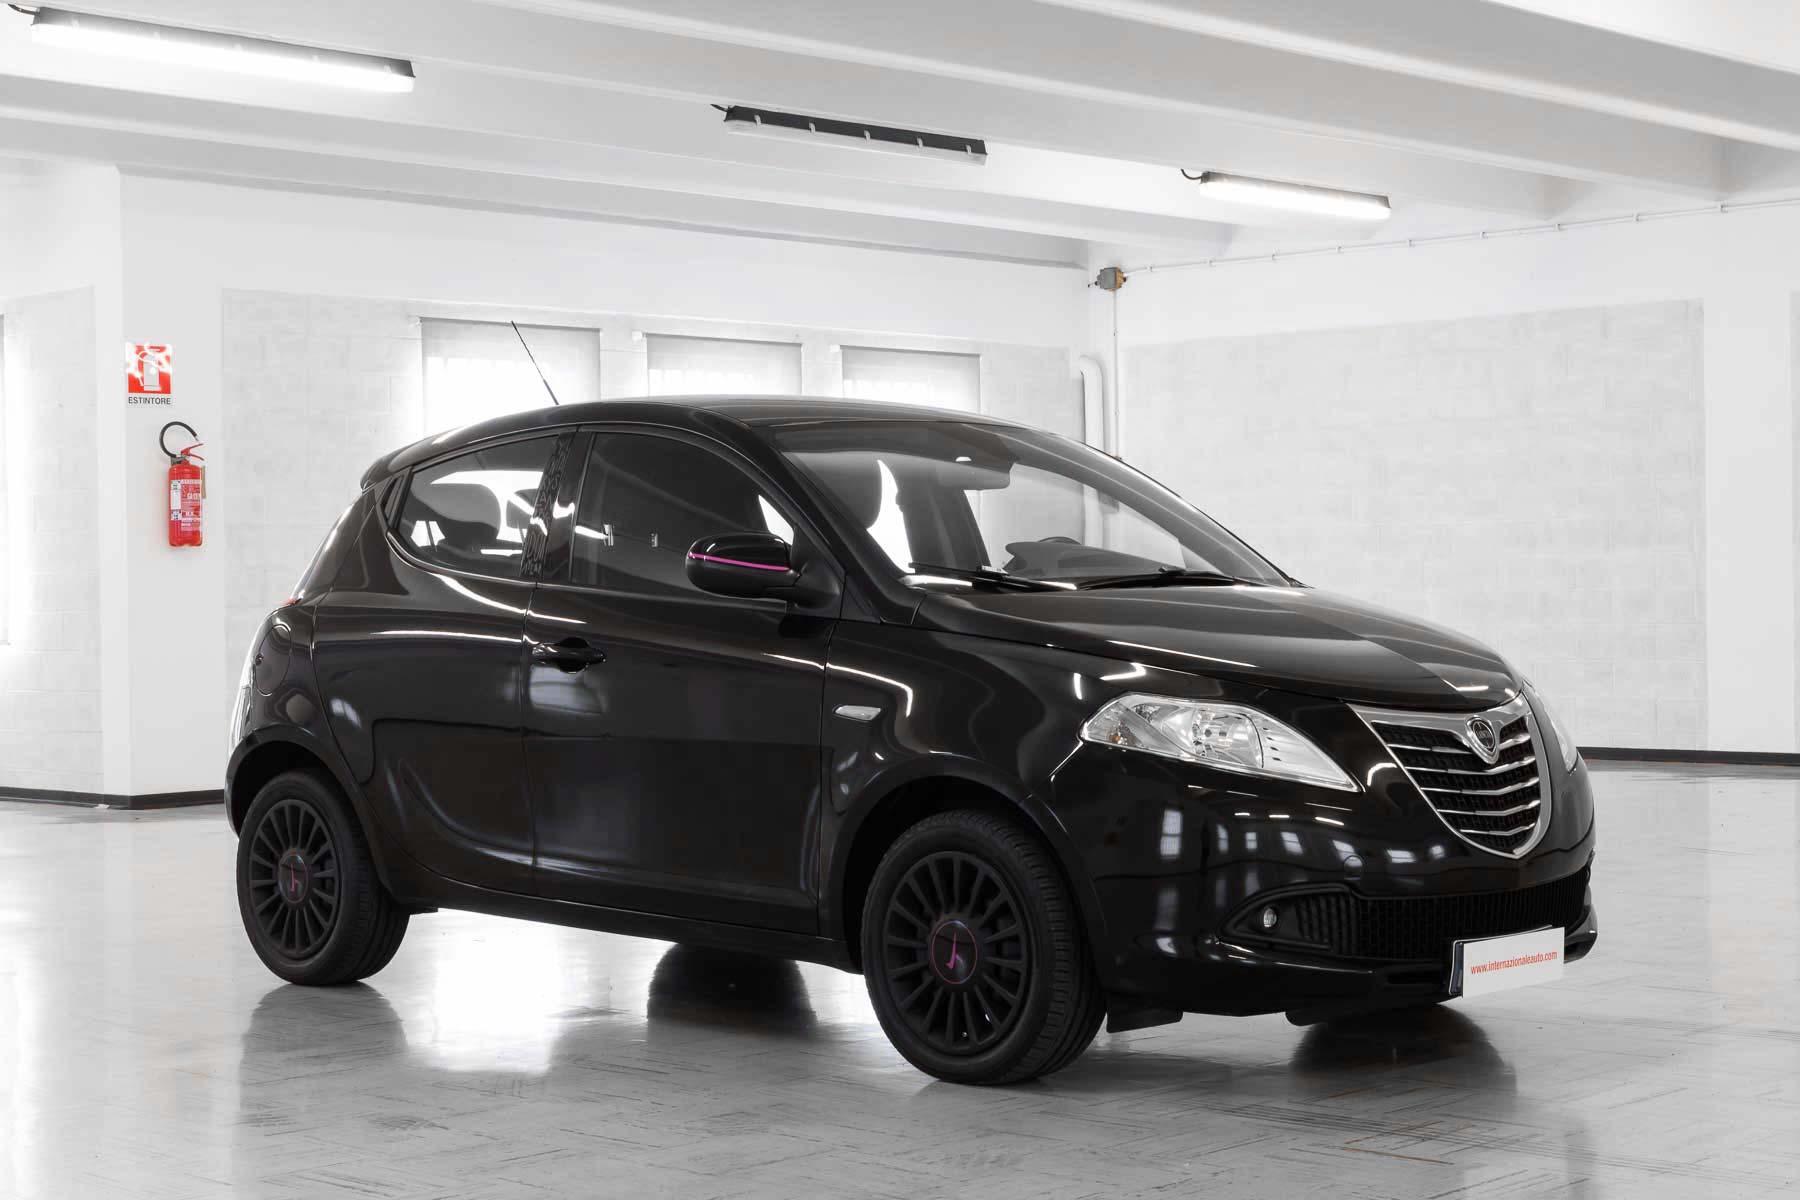 Lancia Ypsilon Nera Elefantino Usata Lato